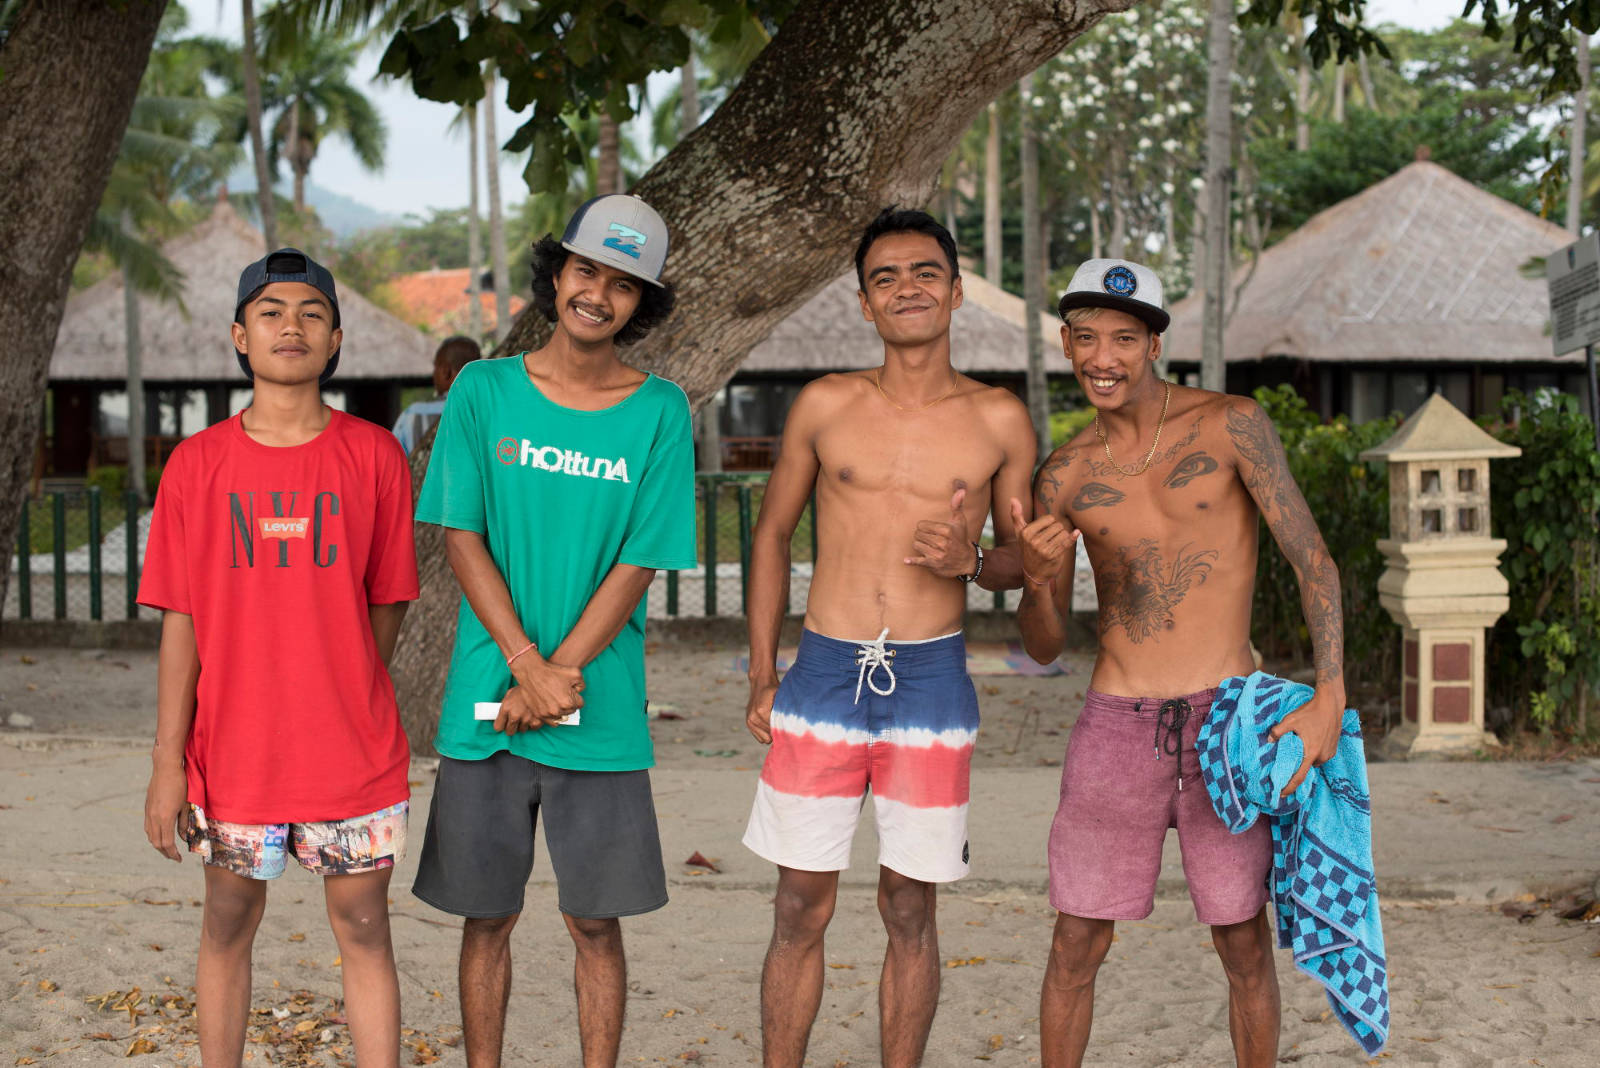 Tailandia chicos posando